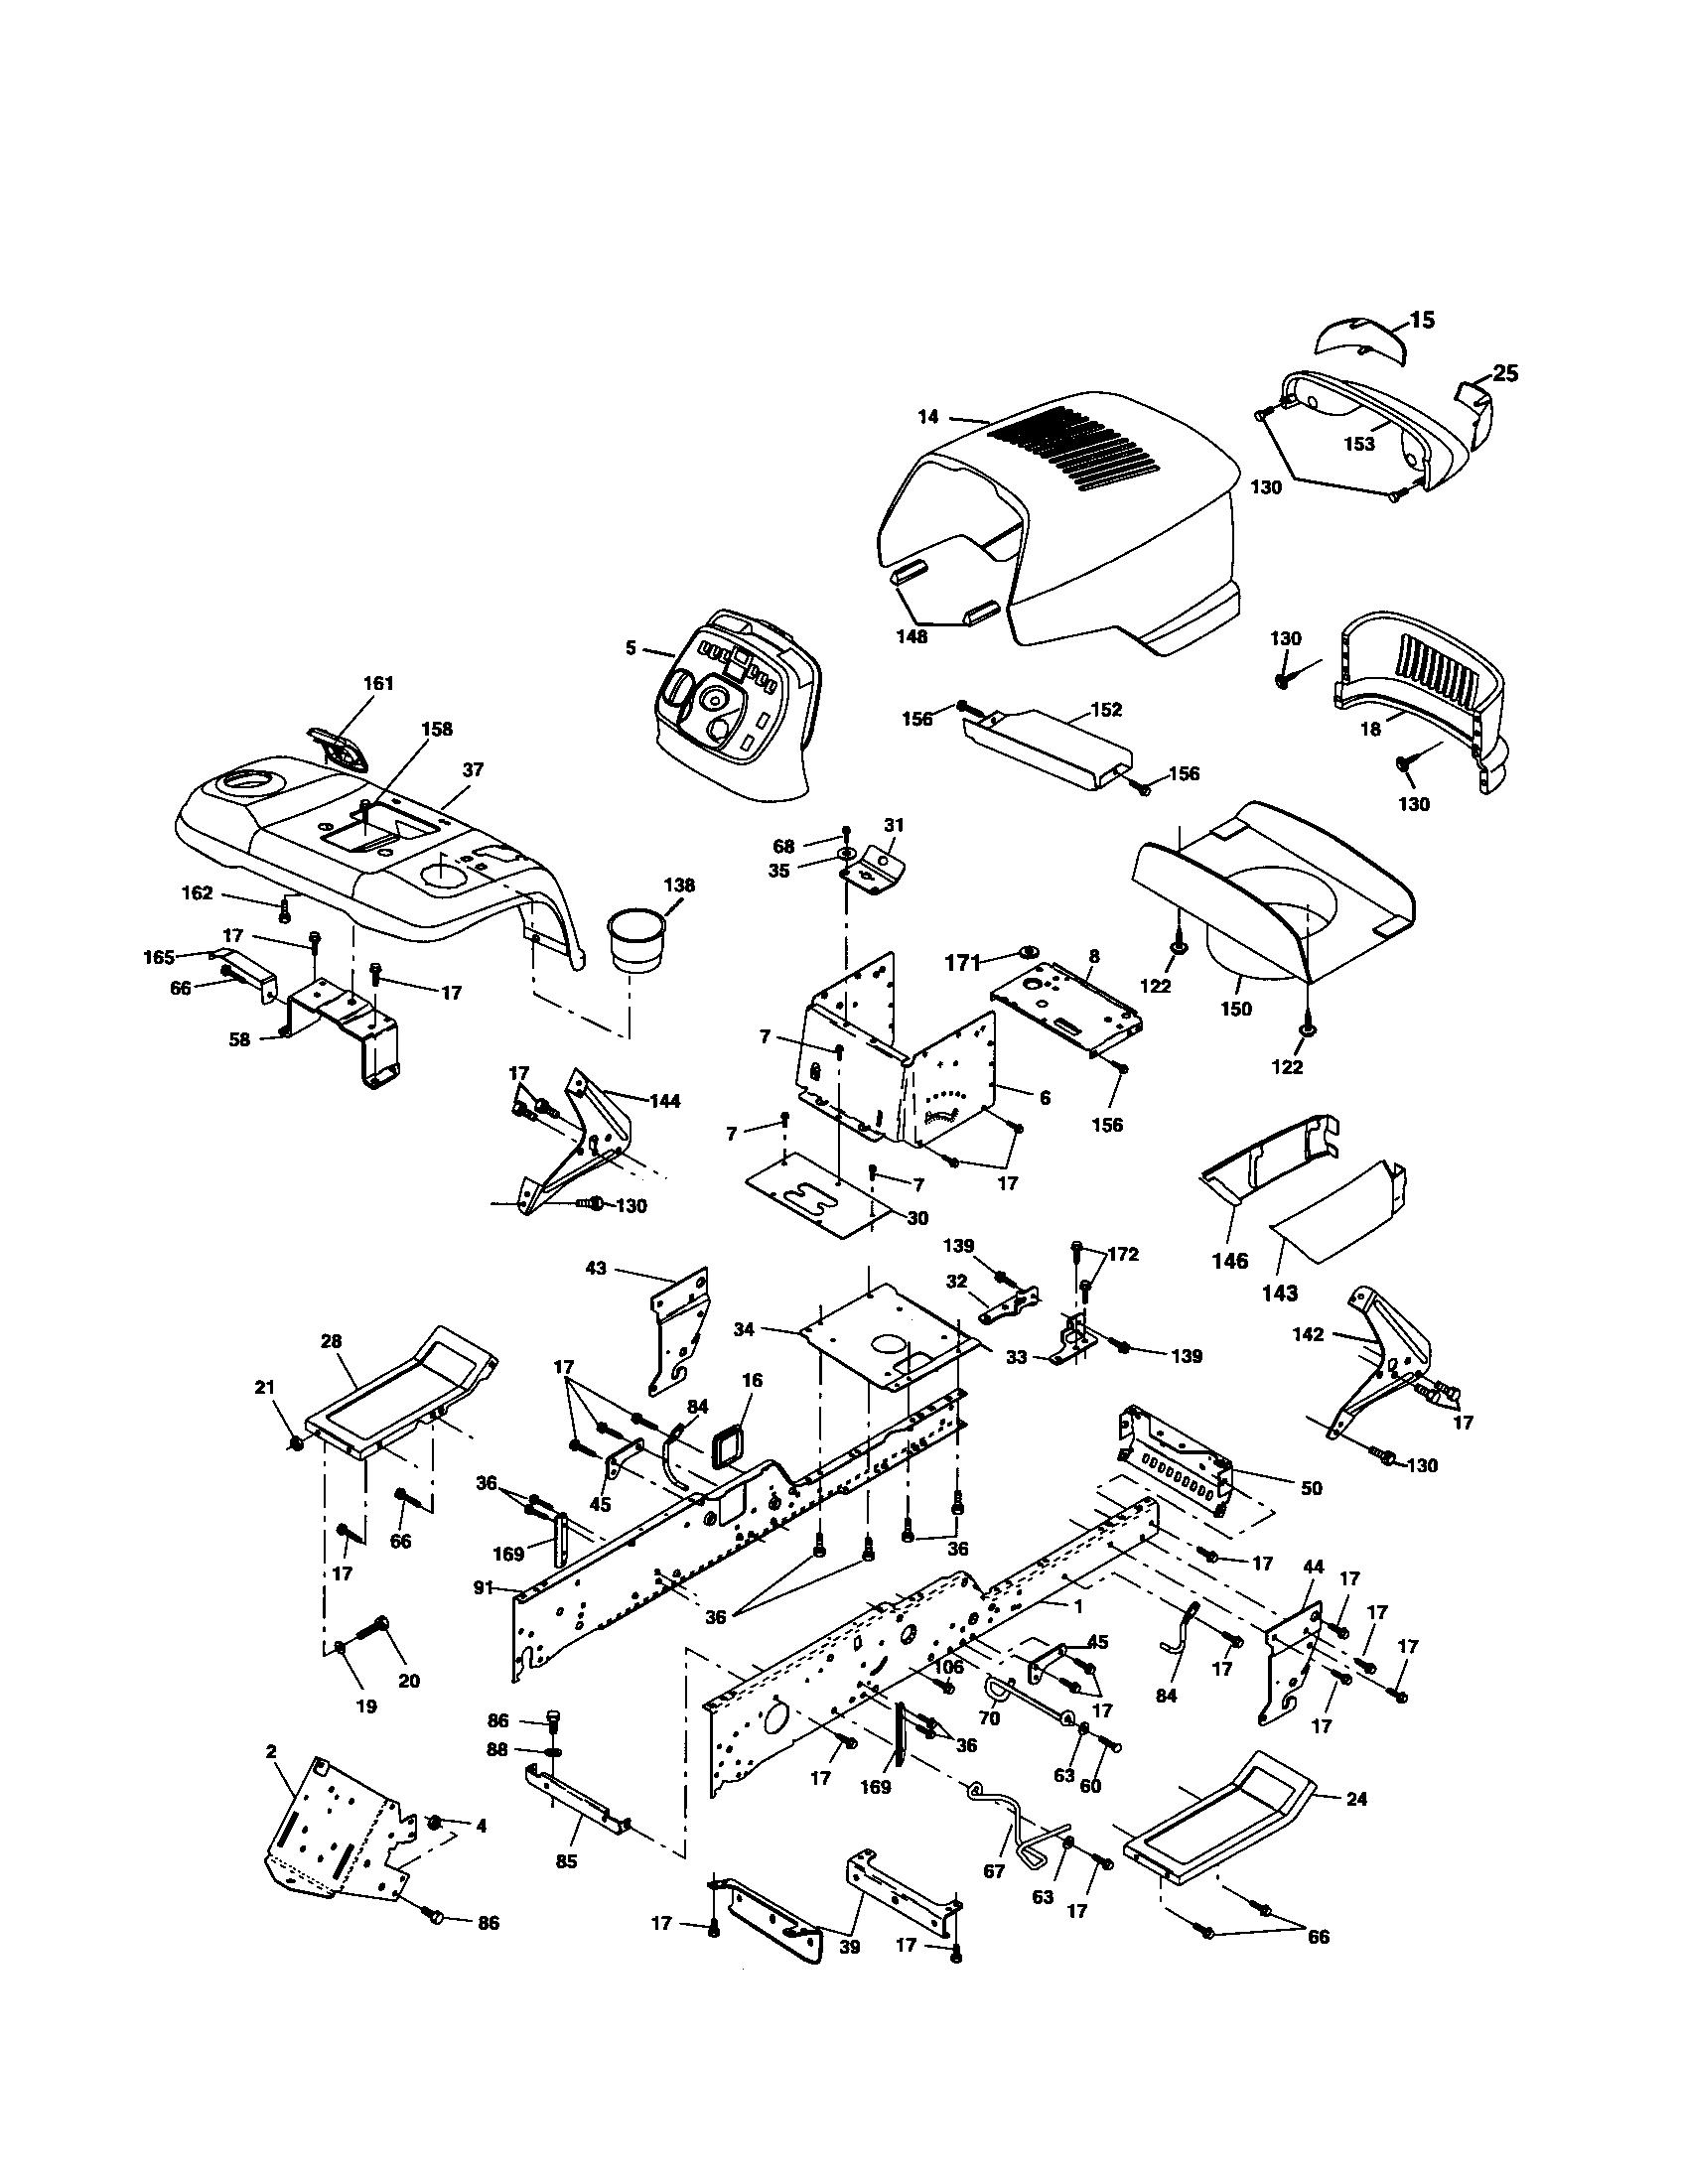 Wiring Diagram Database: Husqvarna Yth2348 Drive Belt Diagram